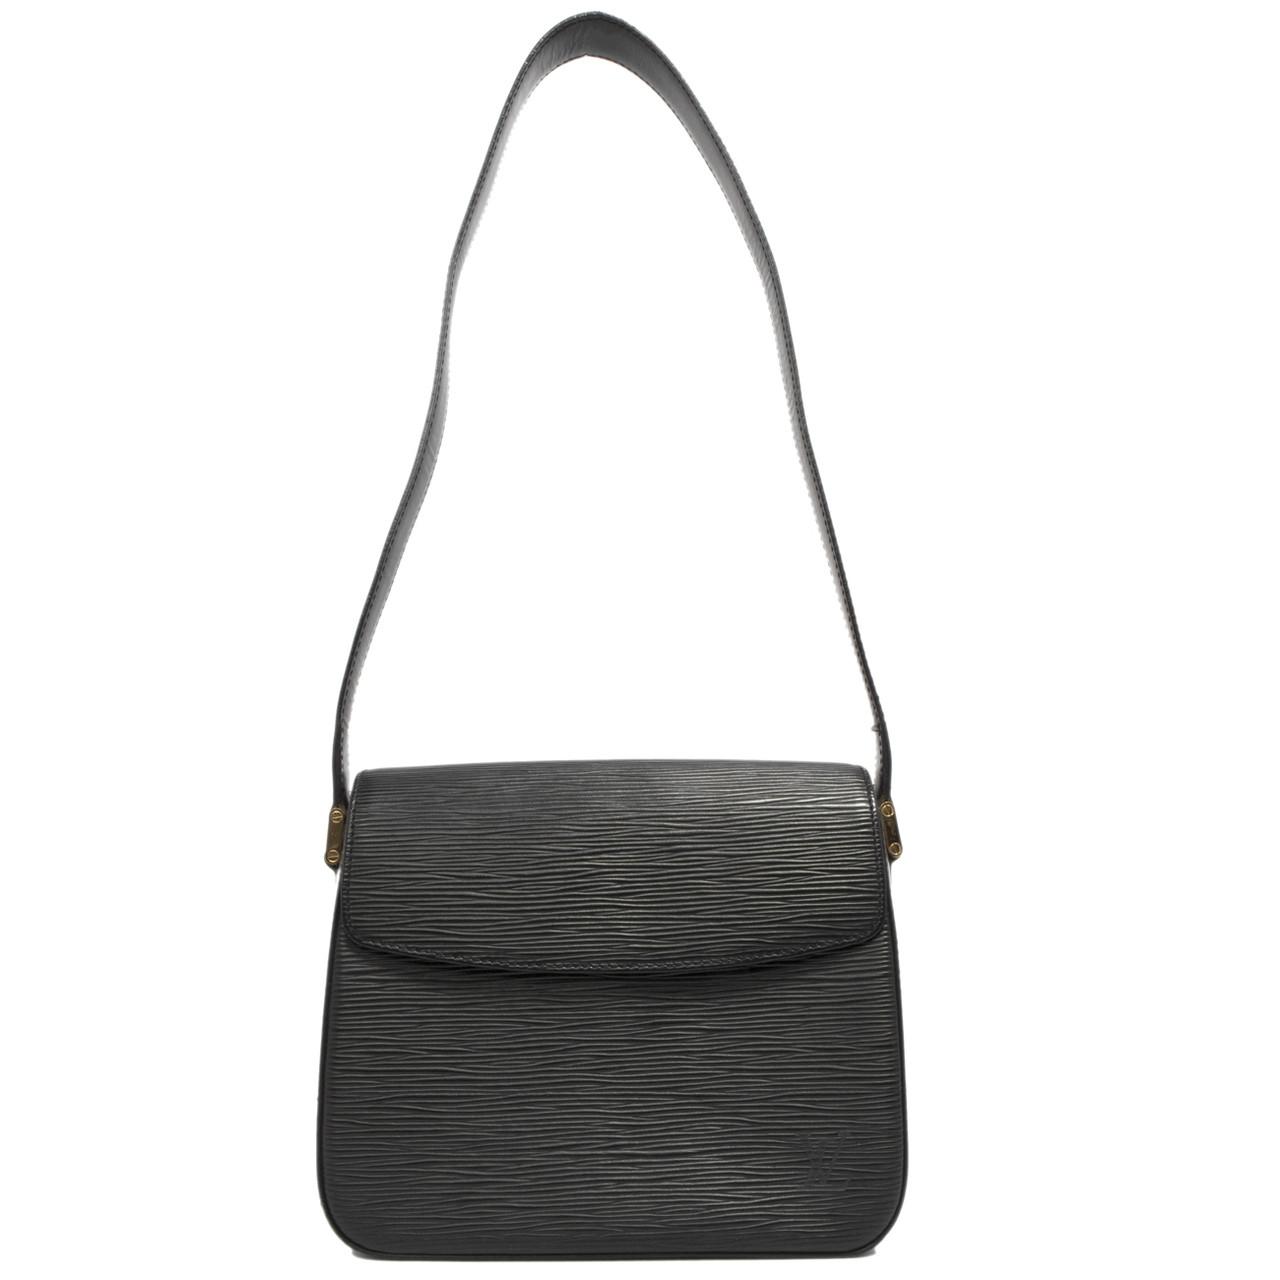 Louis Vuitton Black Epi Buci Bag - modaselle 47fd14298a7ed